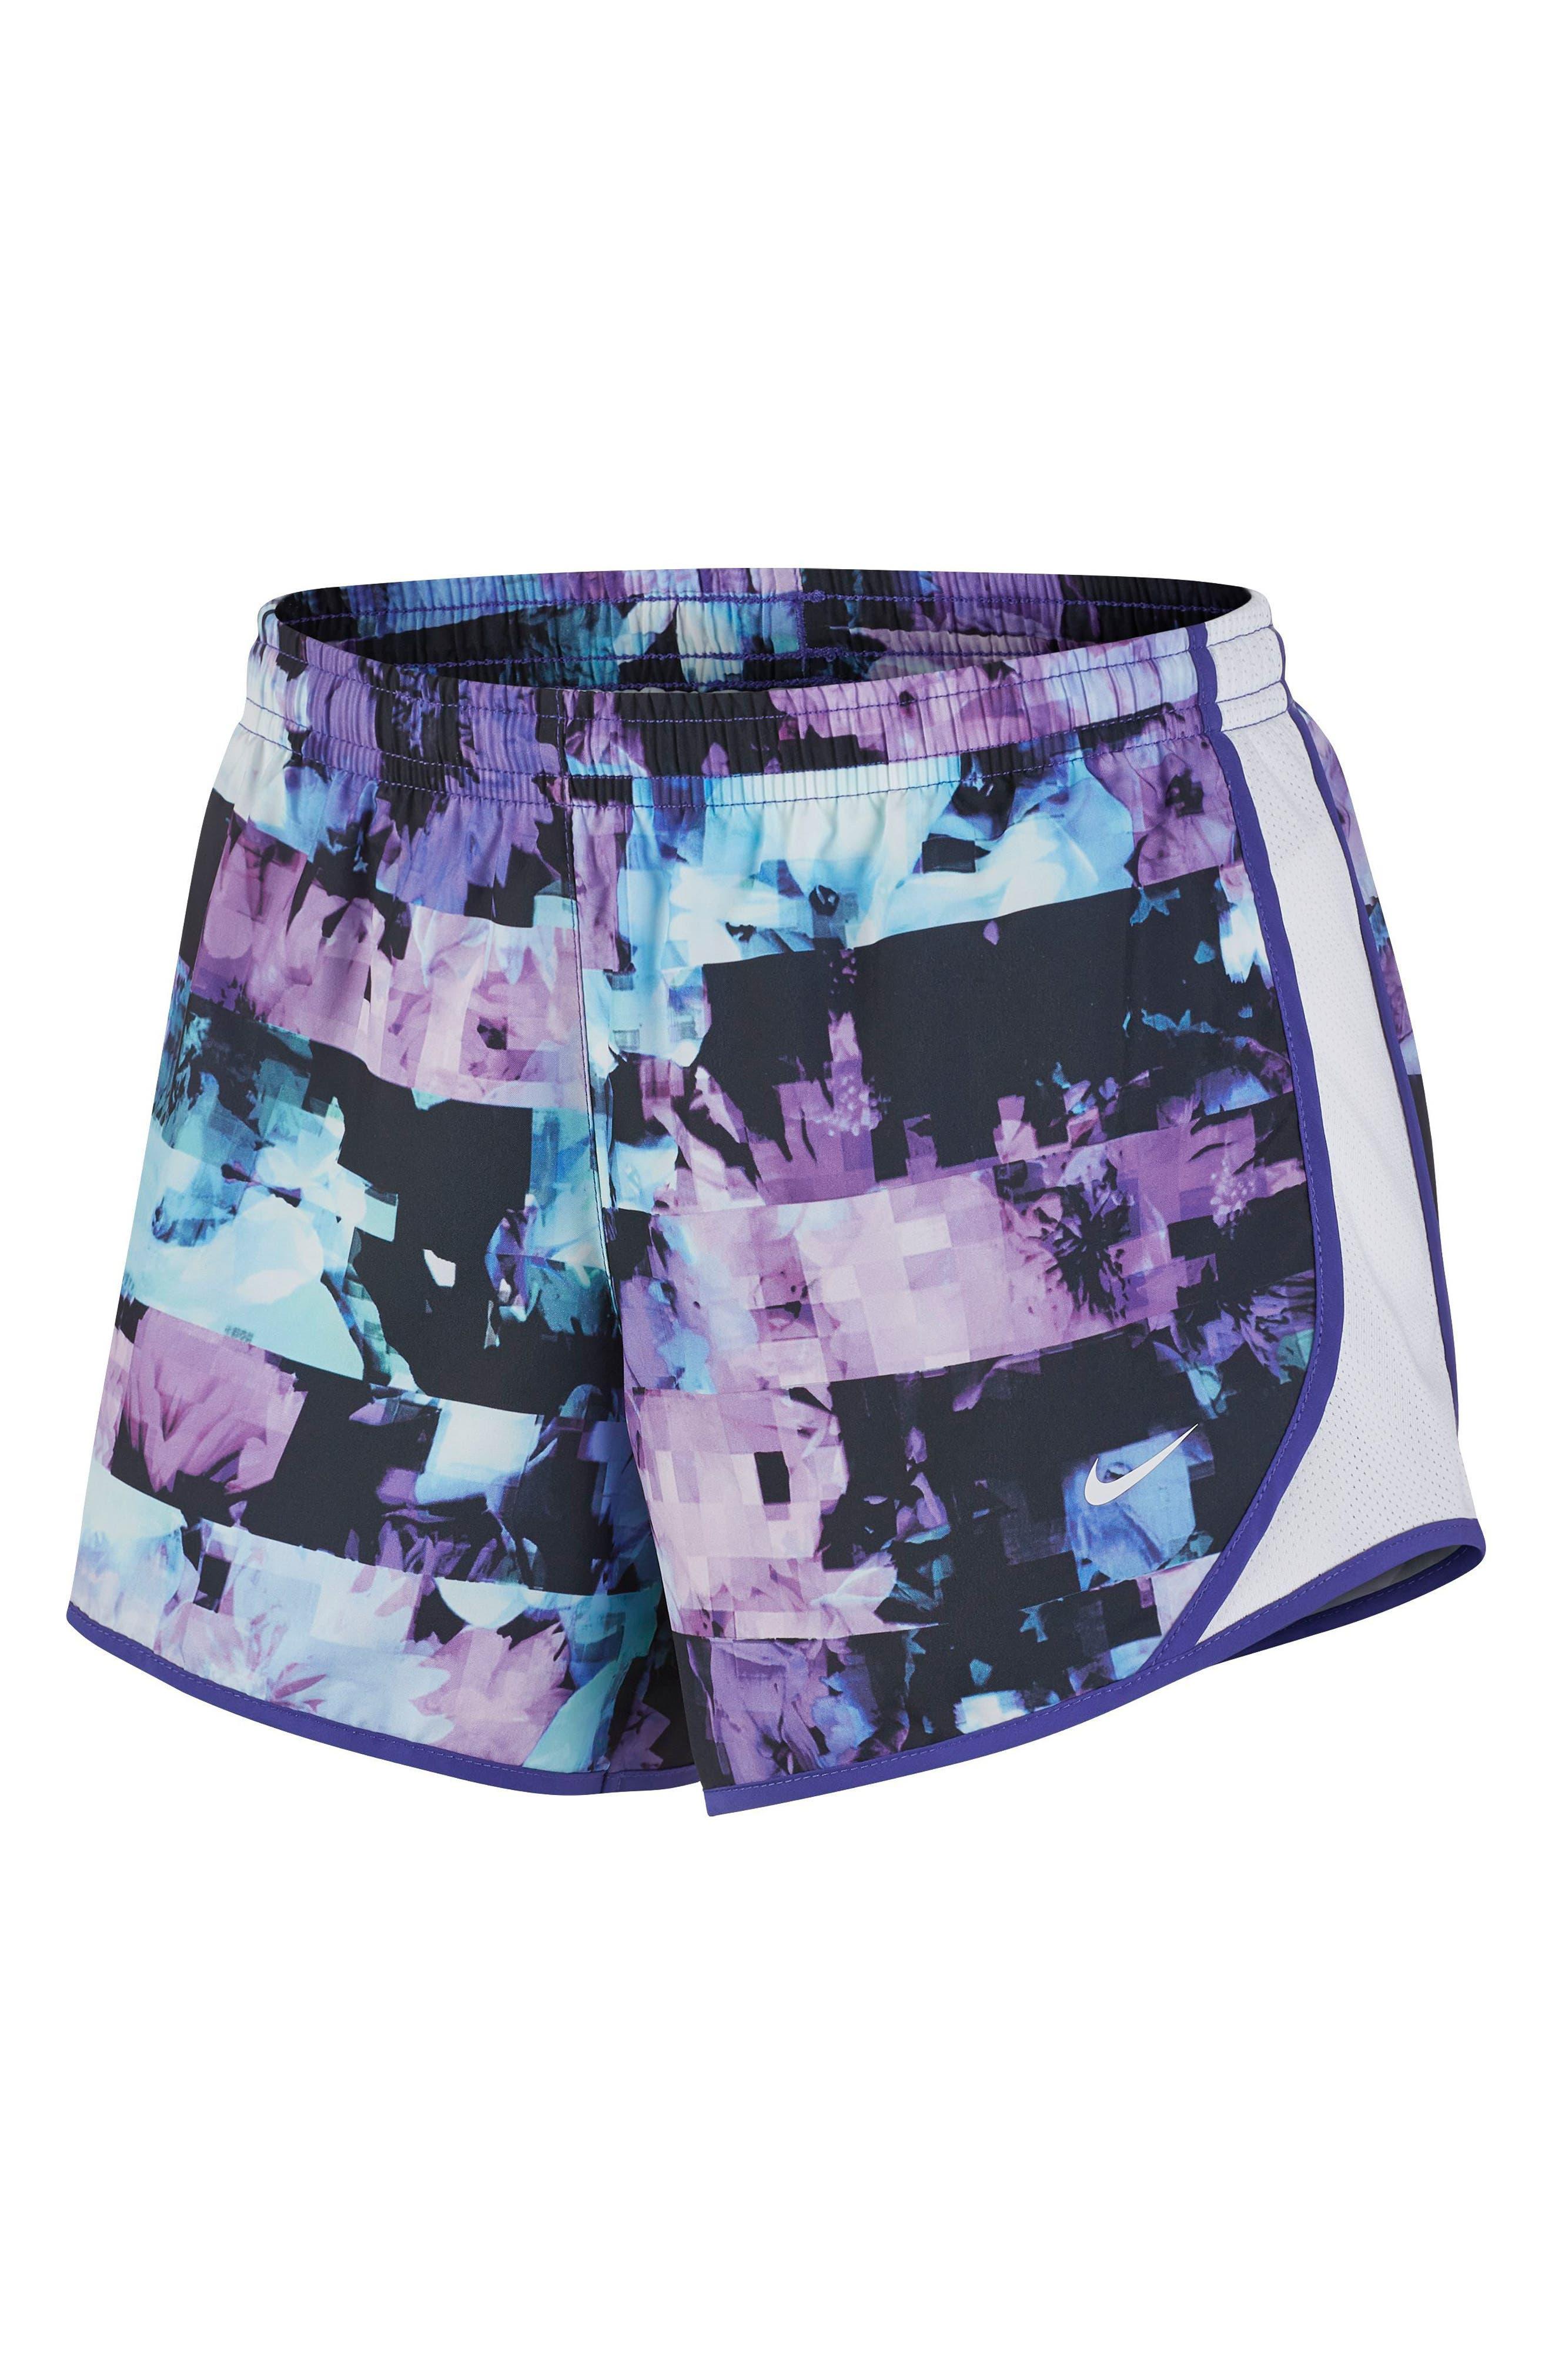 Tempo Dri-FIT Running Shorts,                             Main thumbnail 1, color,                             Persian Violet/ White